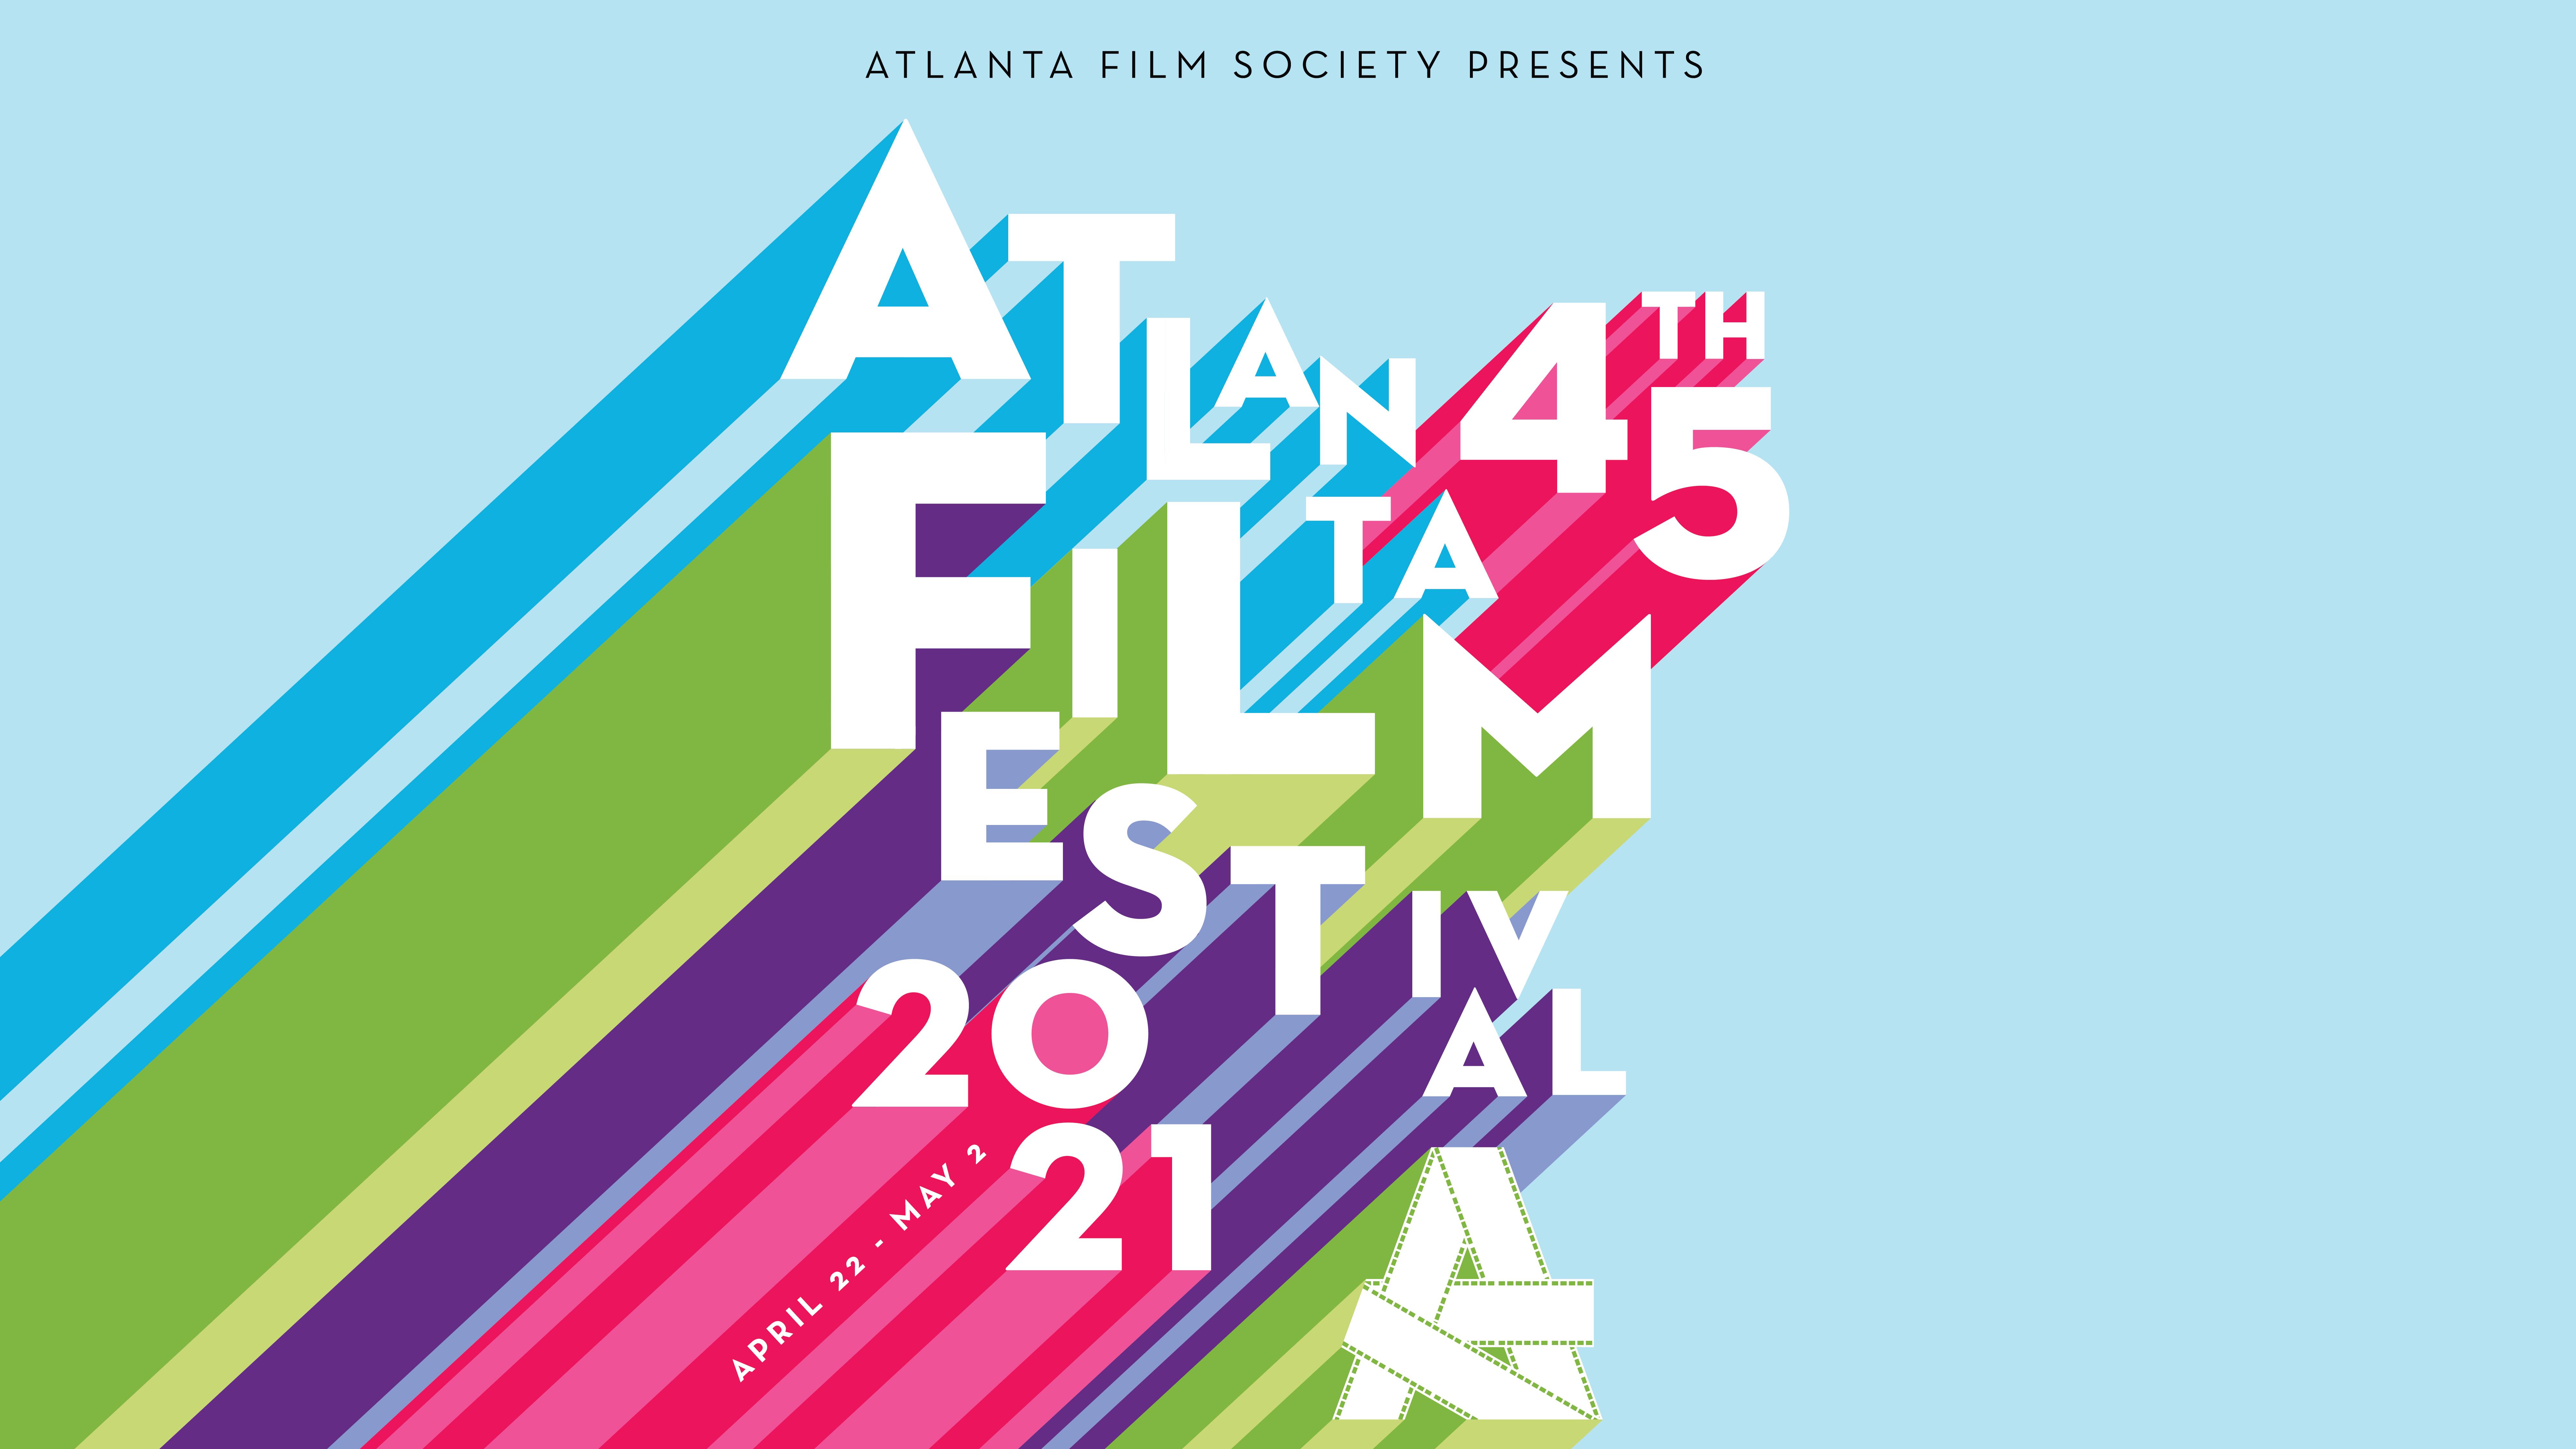 2021 Atlanta Film Festival